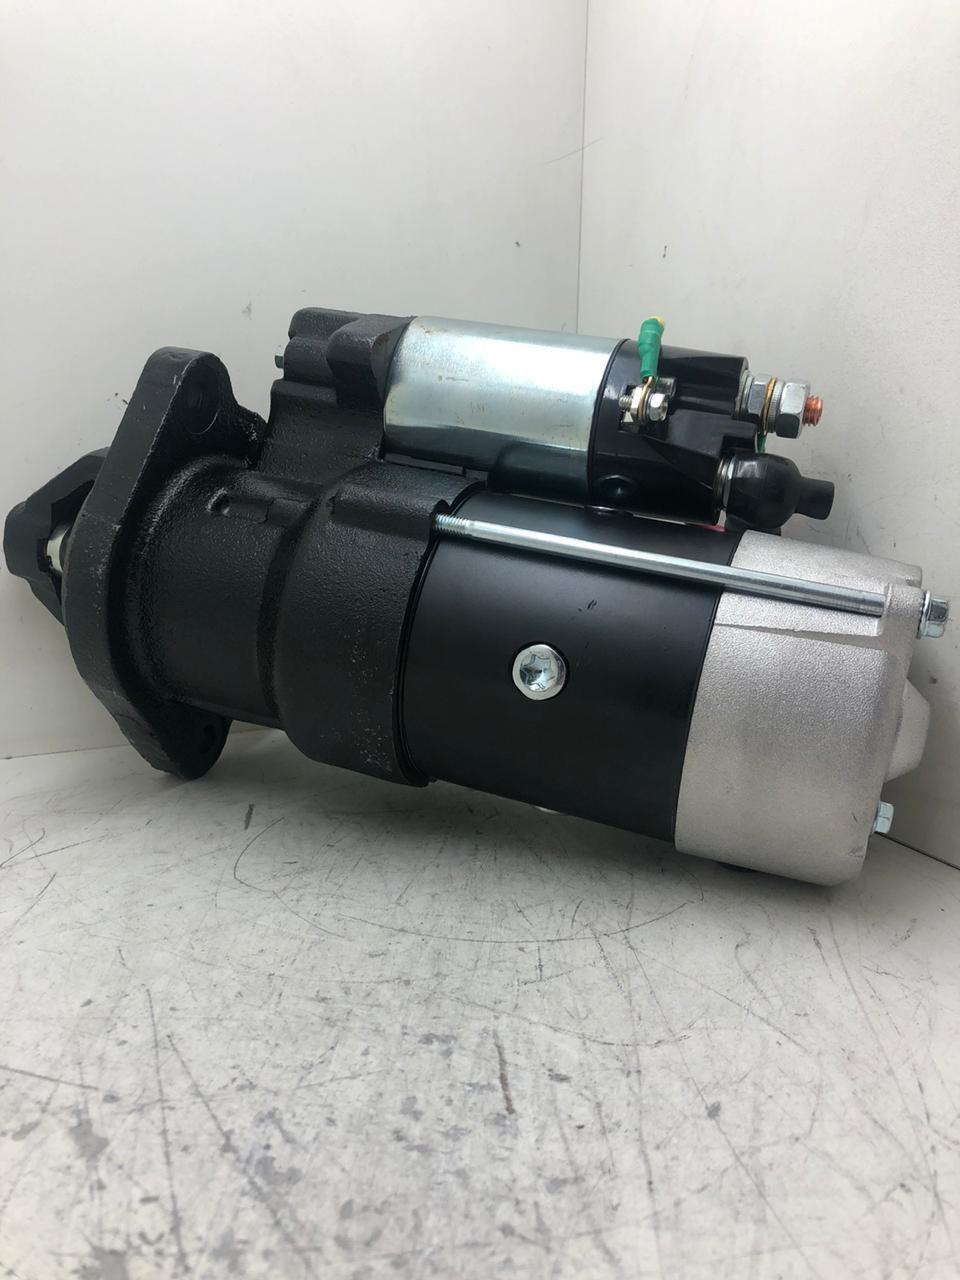 Motor de Partida Arranque Guindaste xcmg liugong para Diesel Weichai Dutz m93 24V 10D M93R3008SE 13033591 D 20470 AEC17142